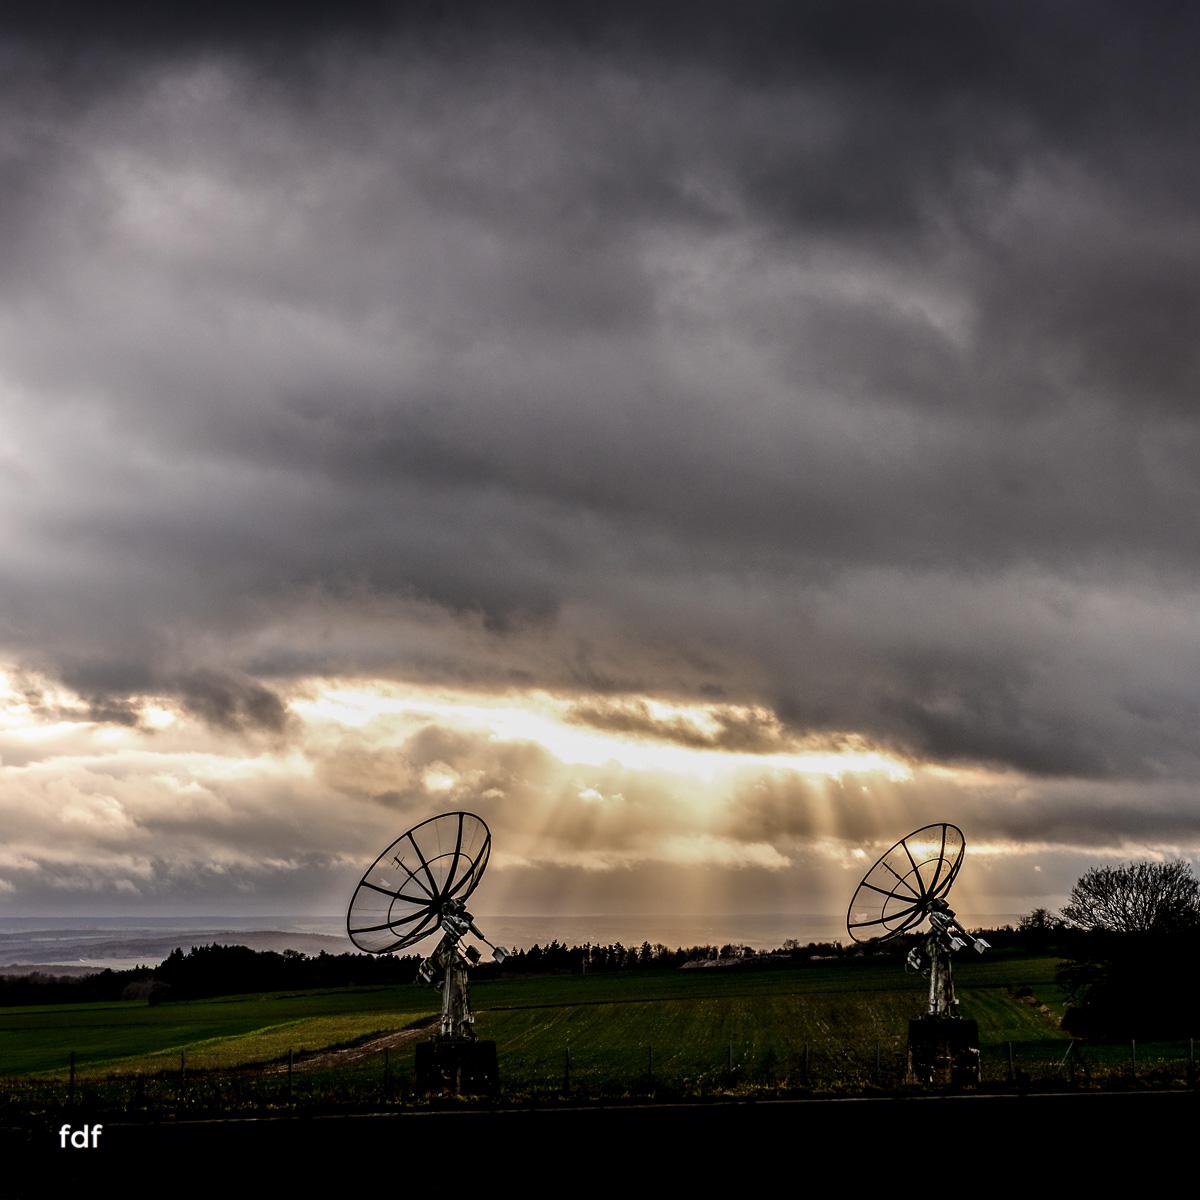 Outer-Space-Radioteleskop-Antennen-Belgien-Urbex-Los-Place-14.jpg